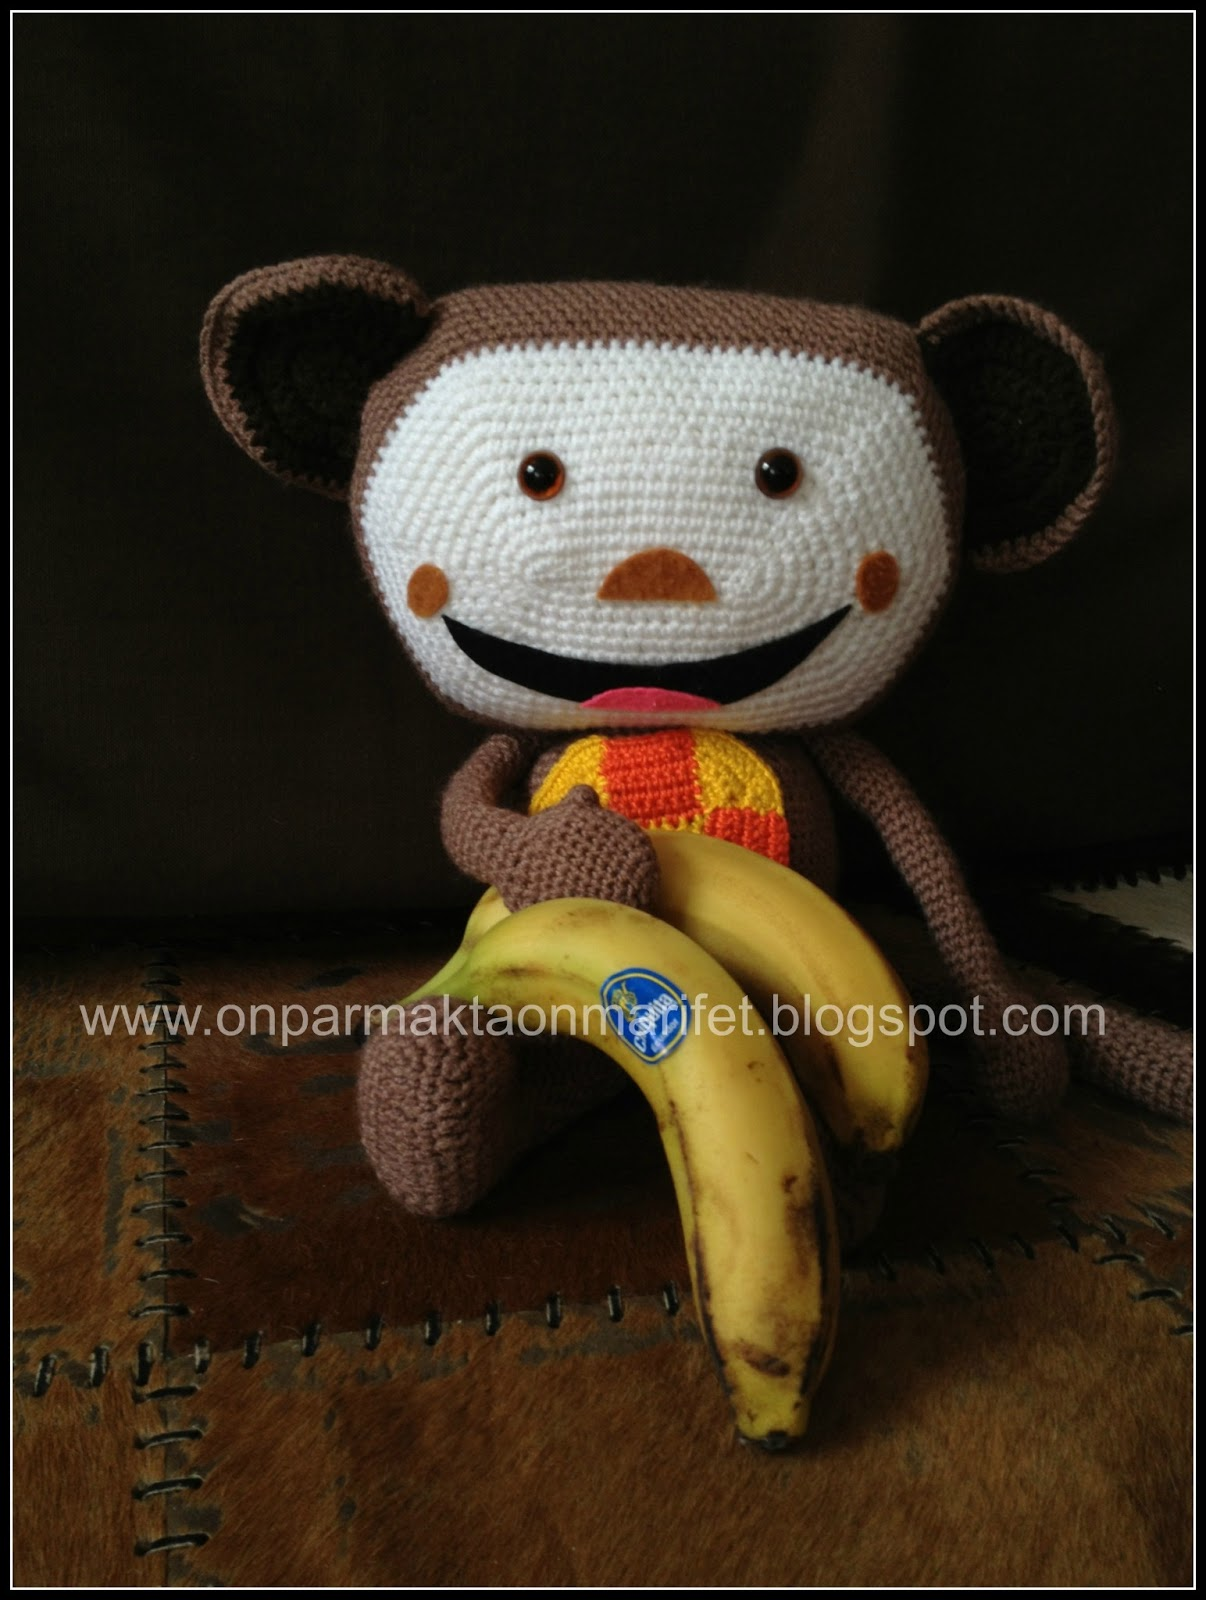 Amigurumi Baby Tv : onparmaktaonmarifet: Amigurumi: Baby TVnin Oliver? :) :)